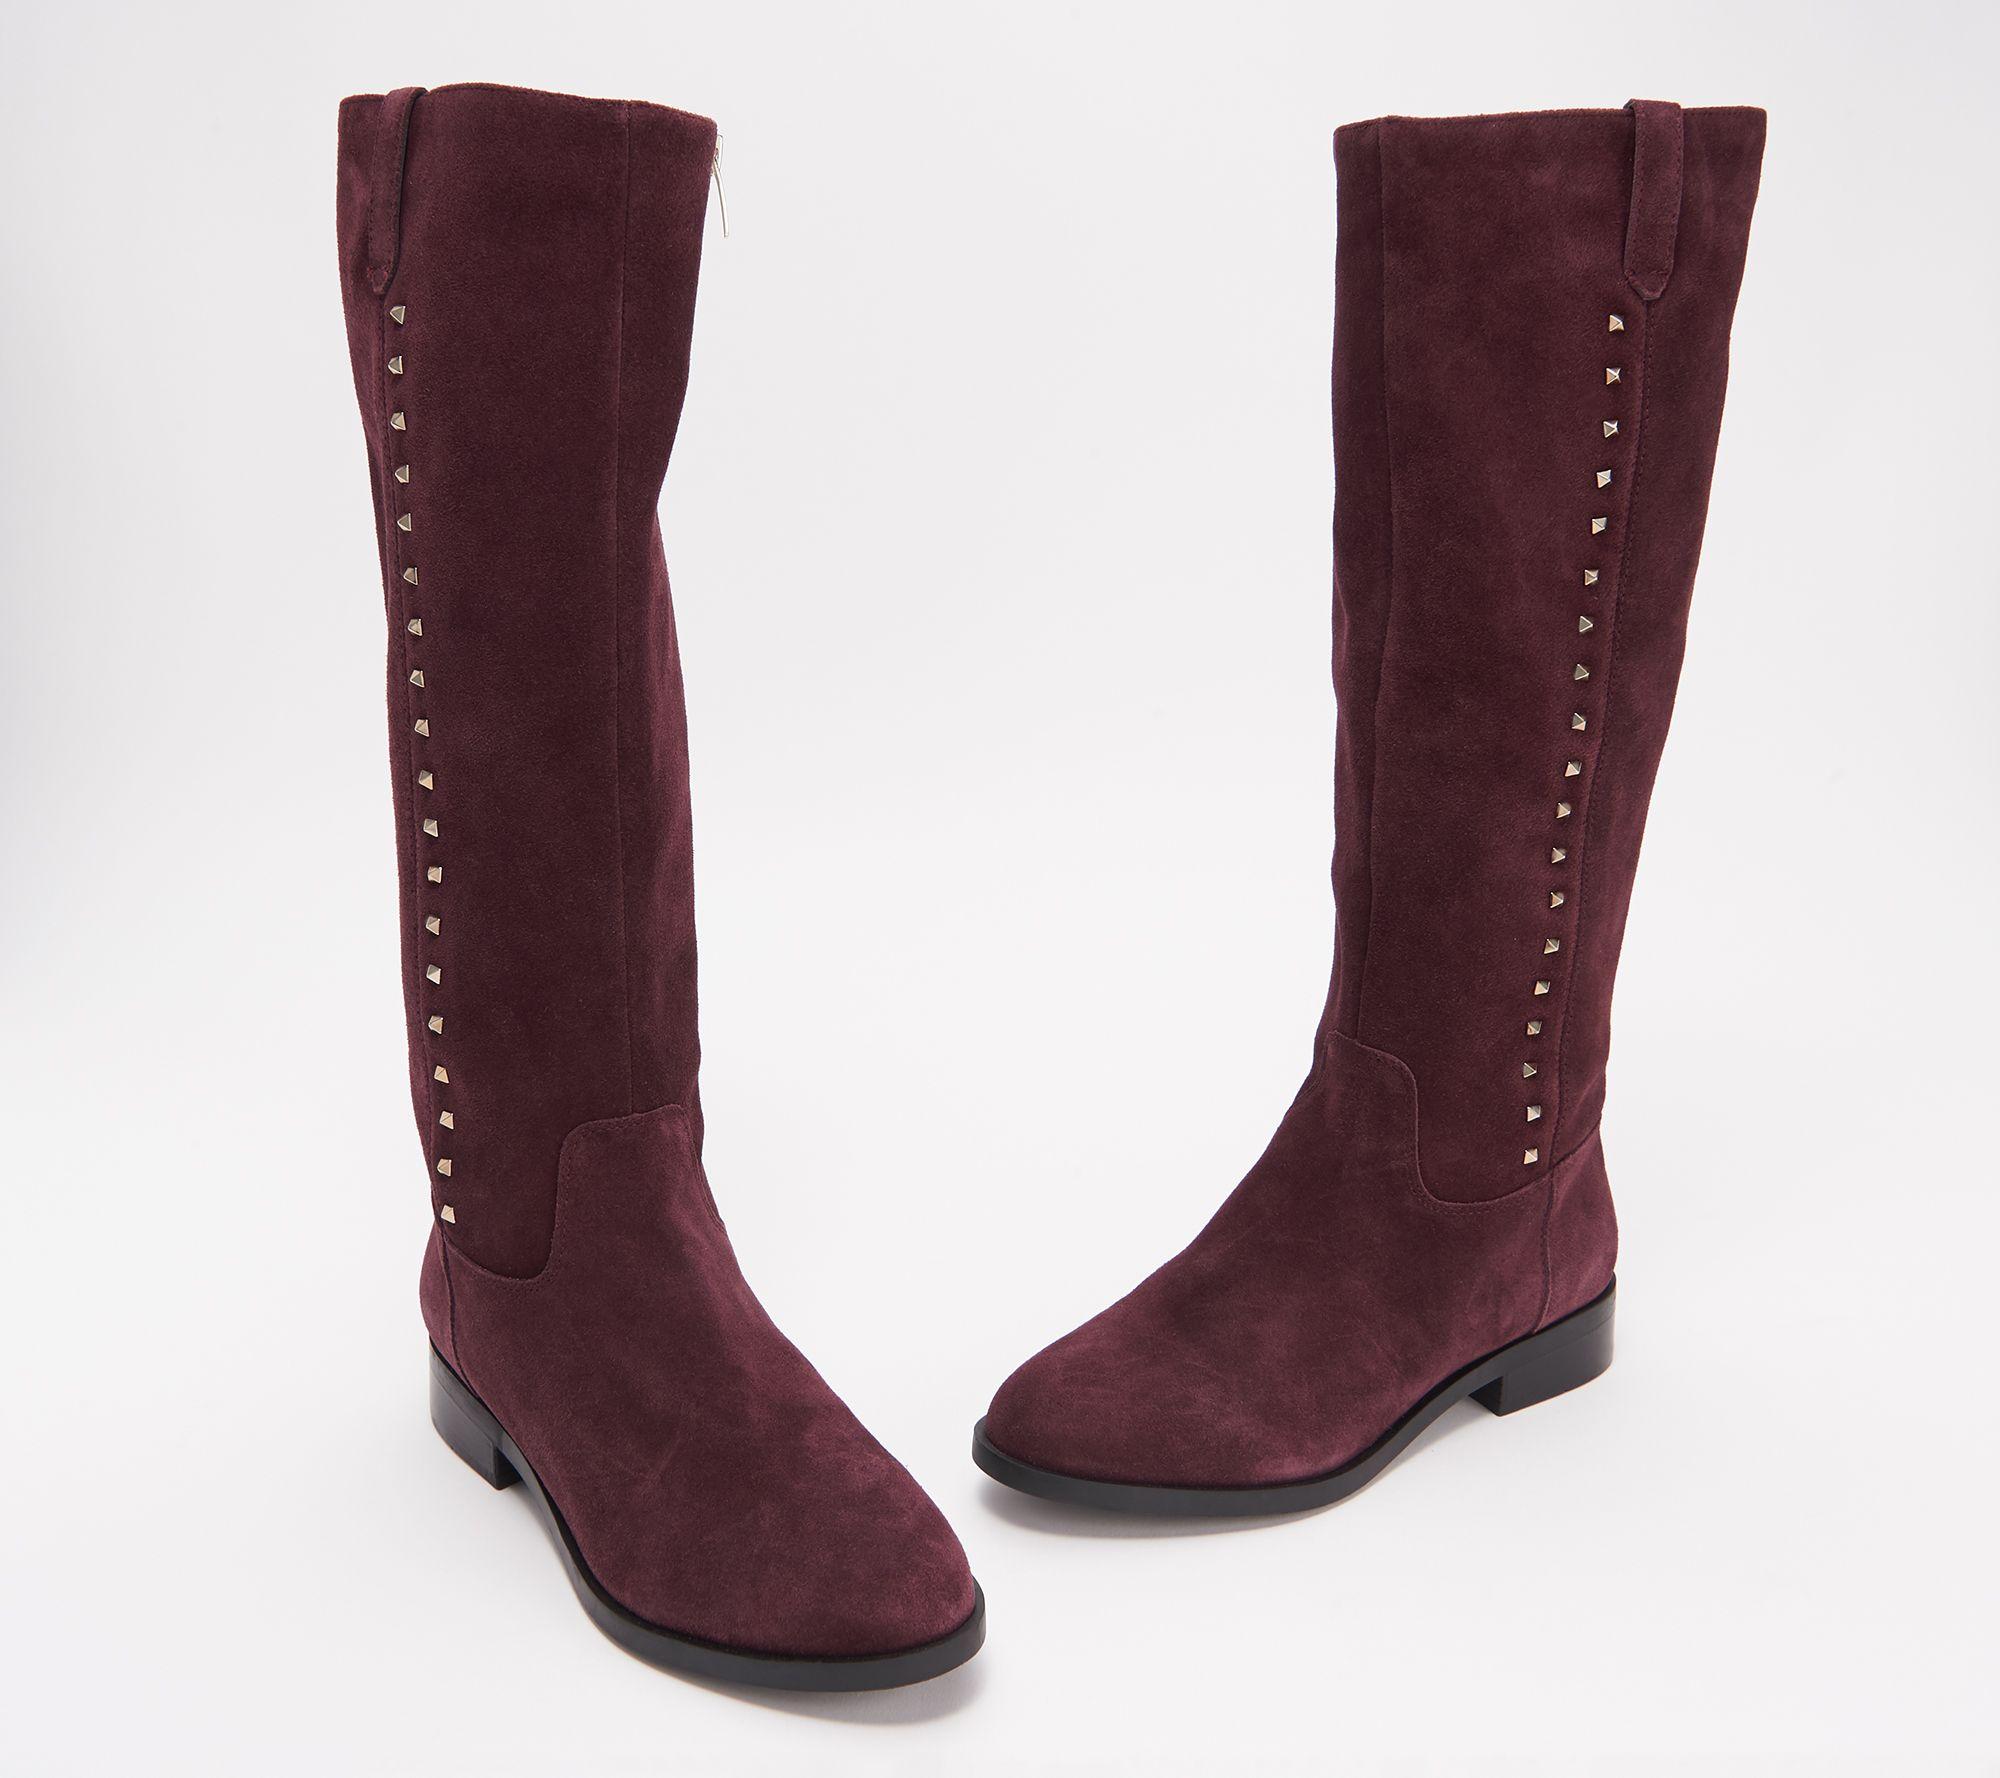 24db25cf8c9 Marc Fisher Medium Calf Leather Tall Shaft Boots - Secrit - Page 1 — QVC.com